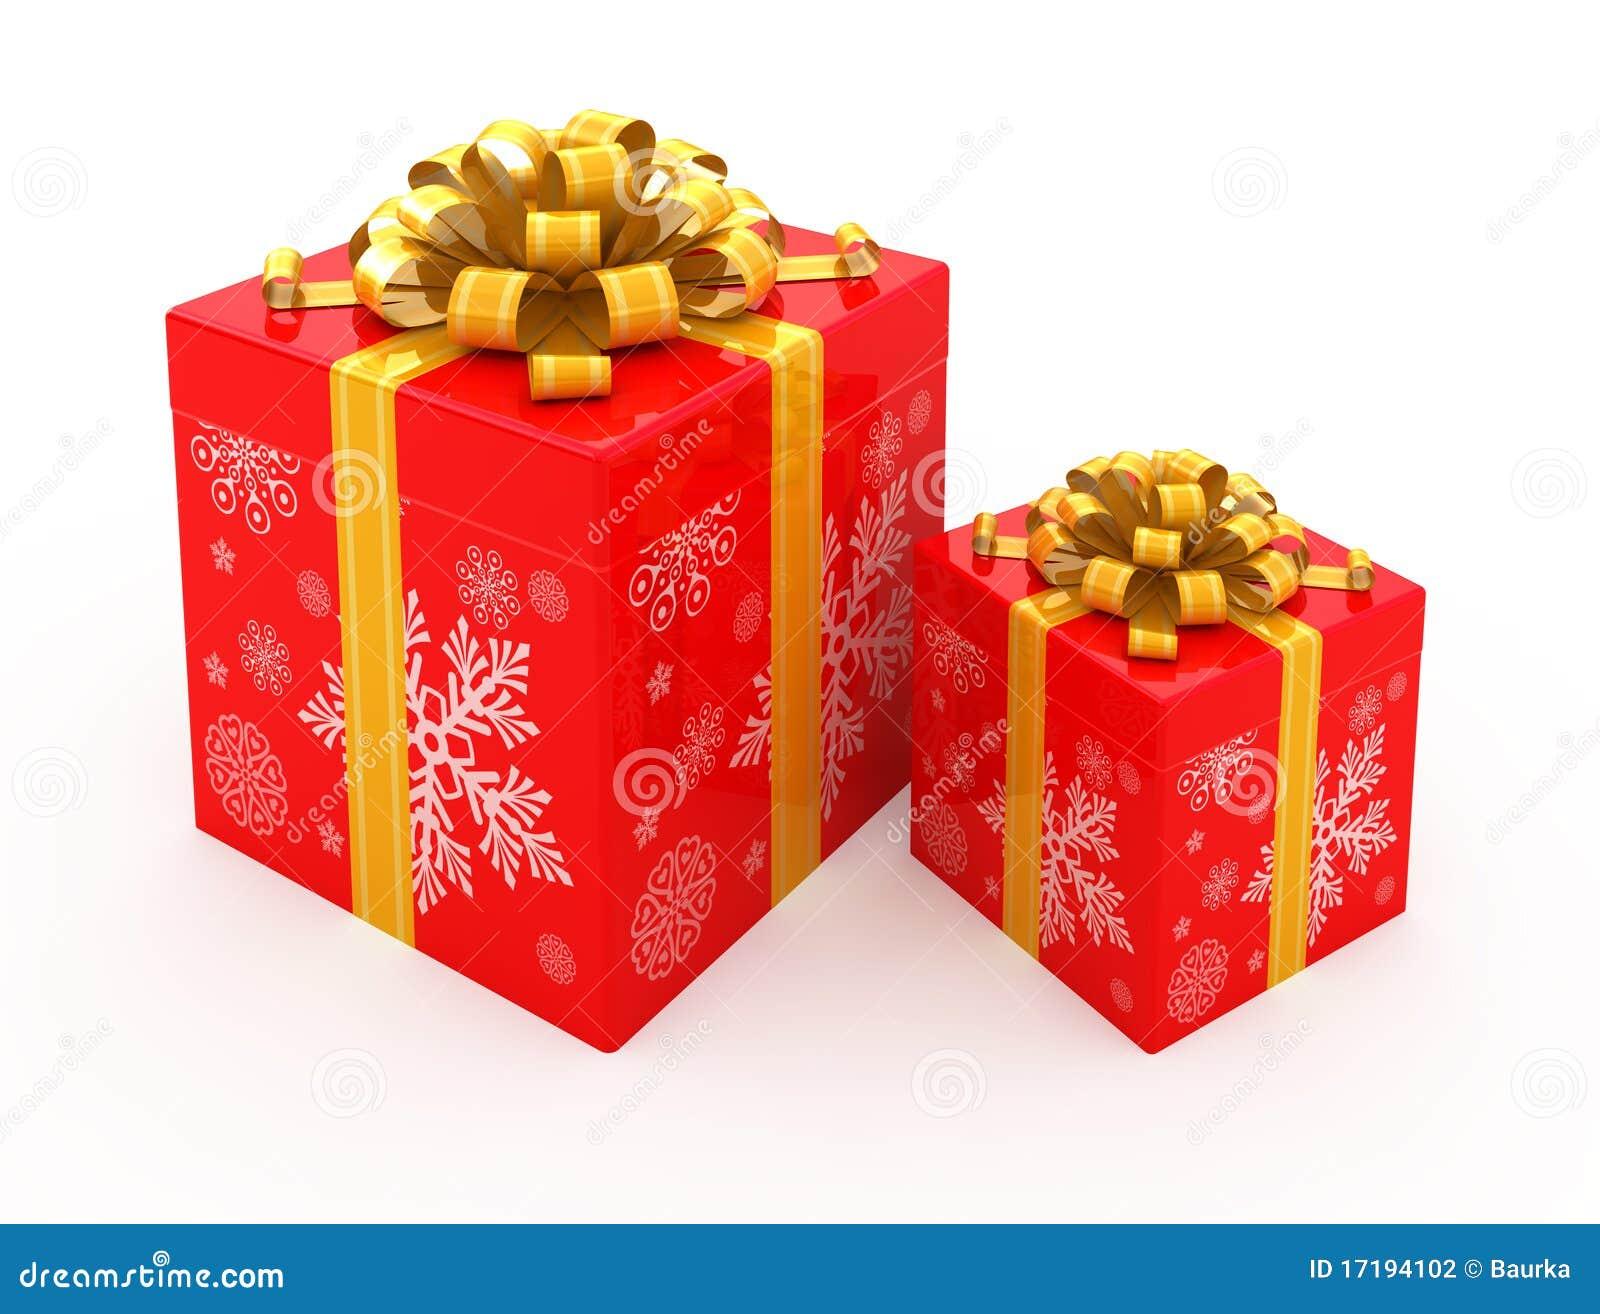 Christmas gift boxes stock illustration. Illustration of ...